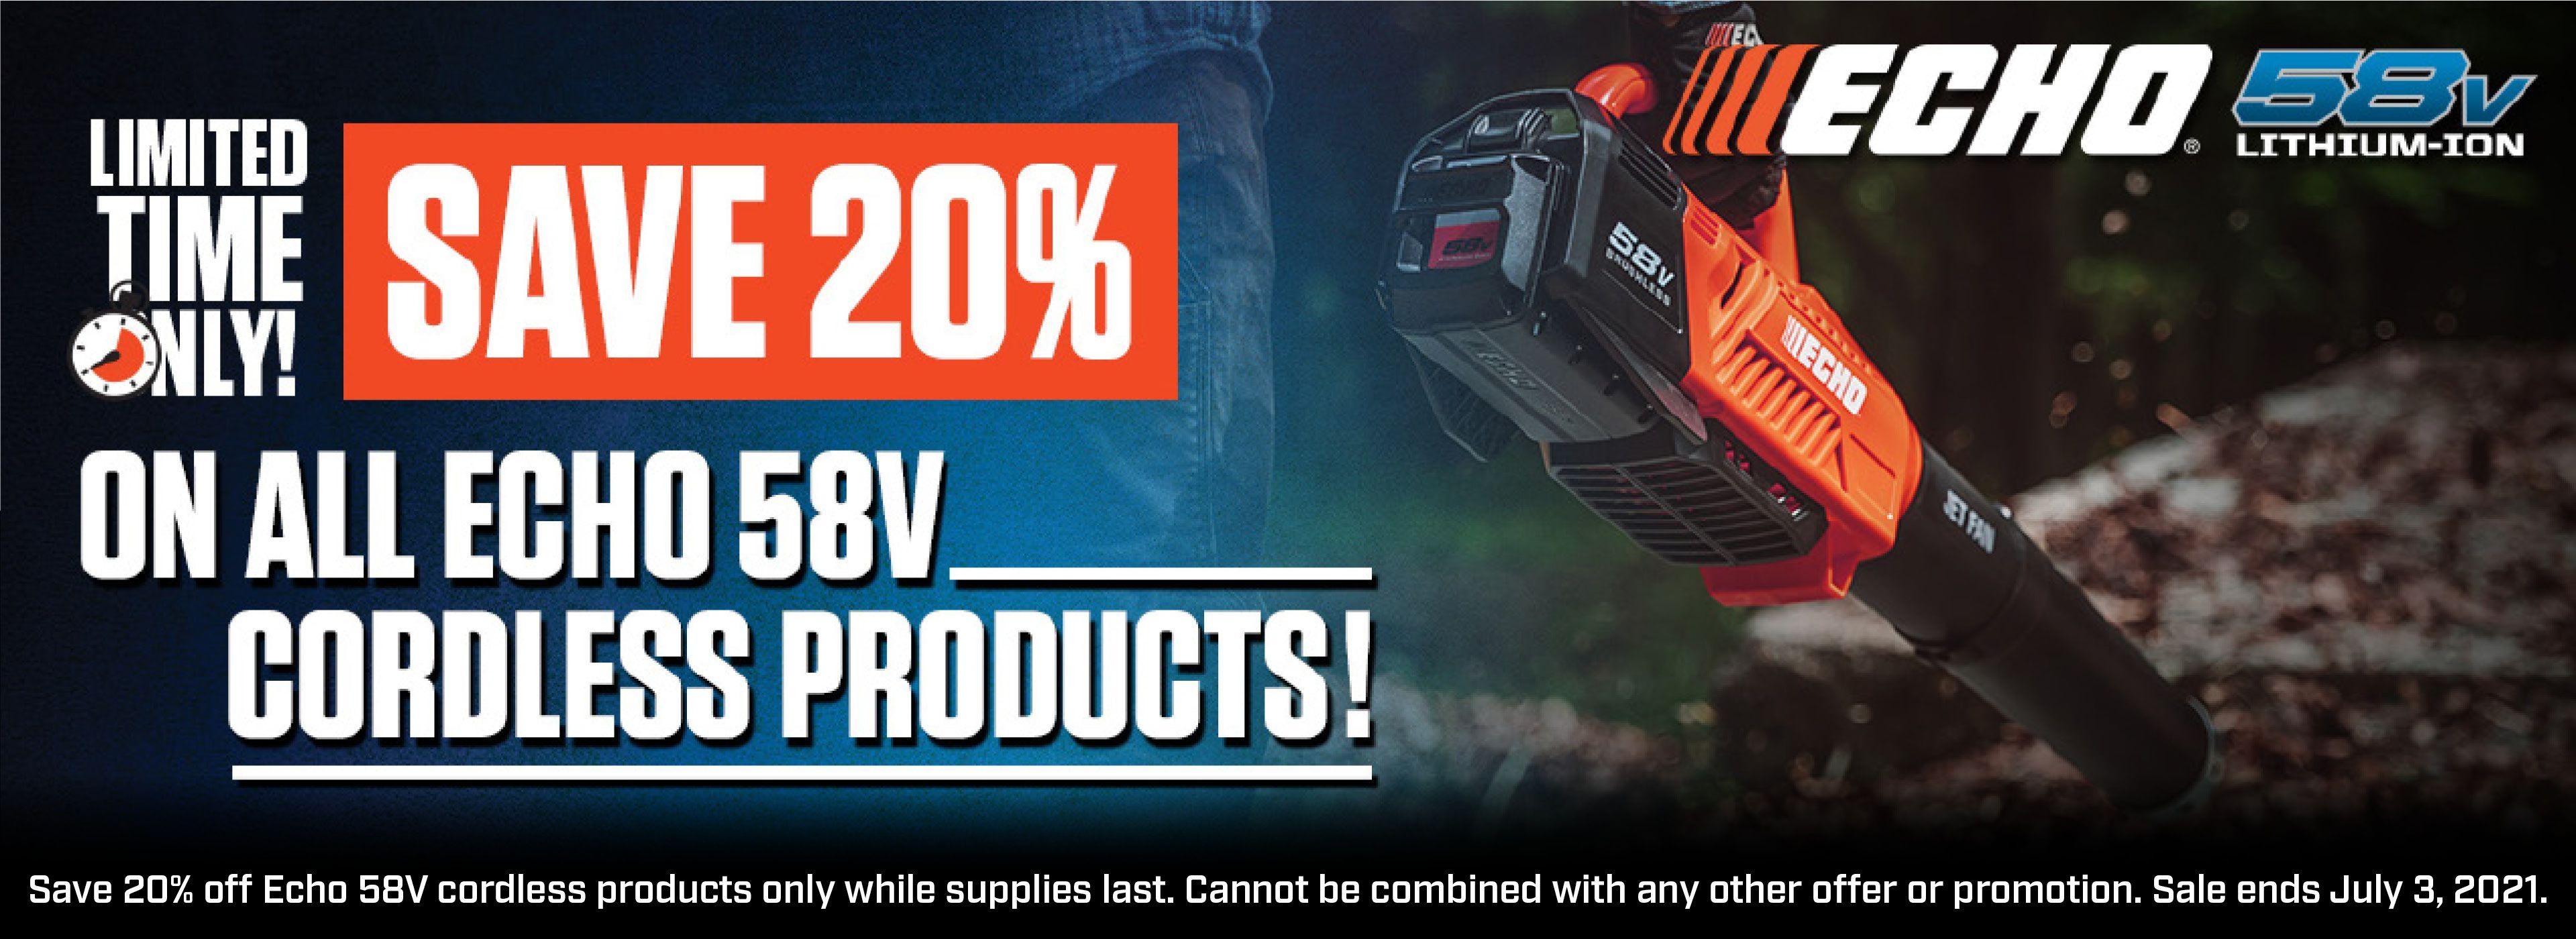 ECHO 58V Battery Equipment Sale